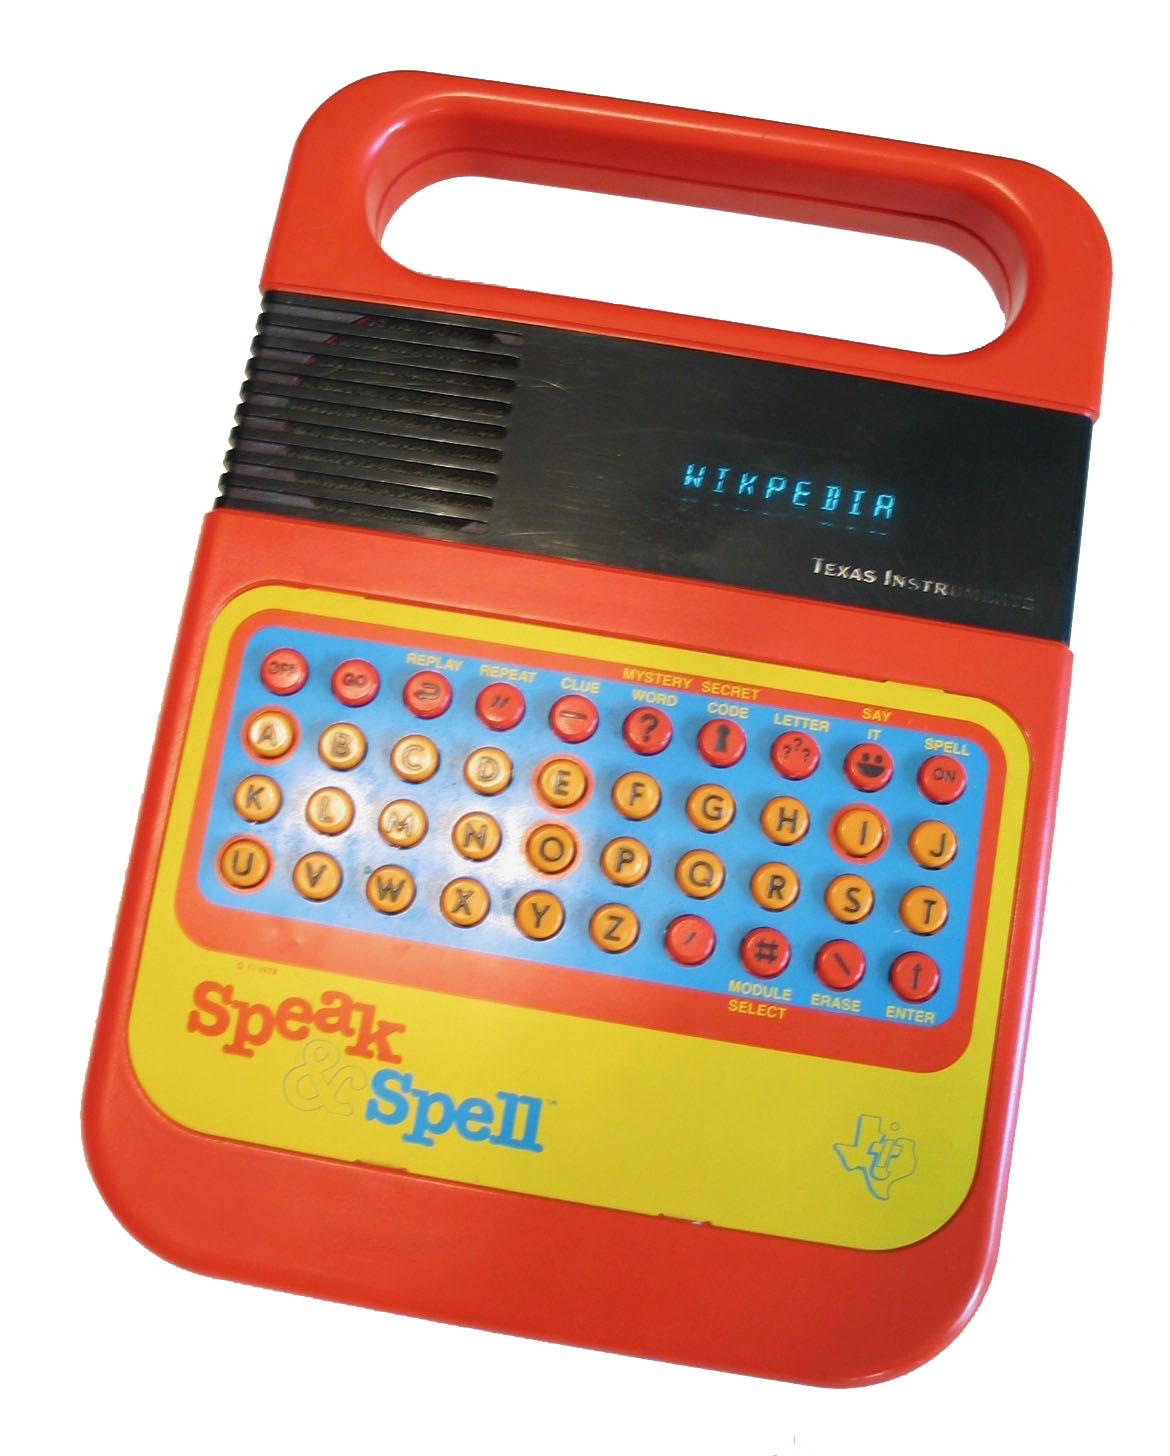 Speak & Spell (toy) - Wikipedia